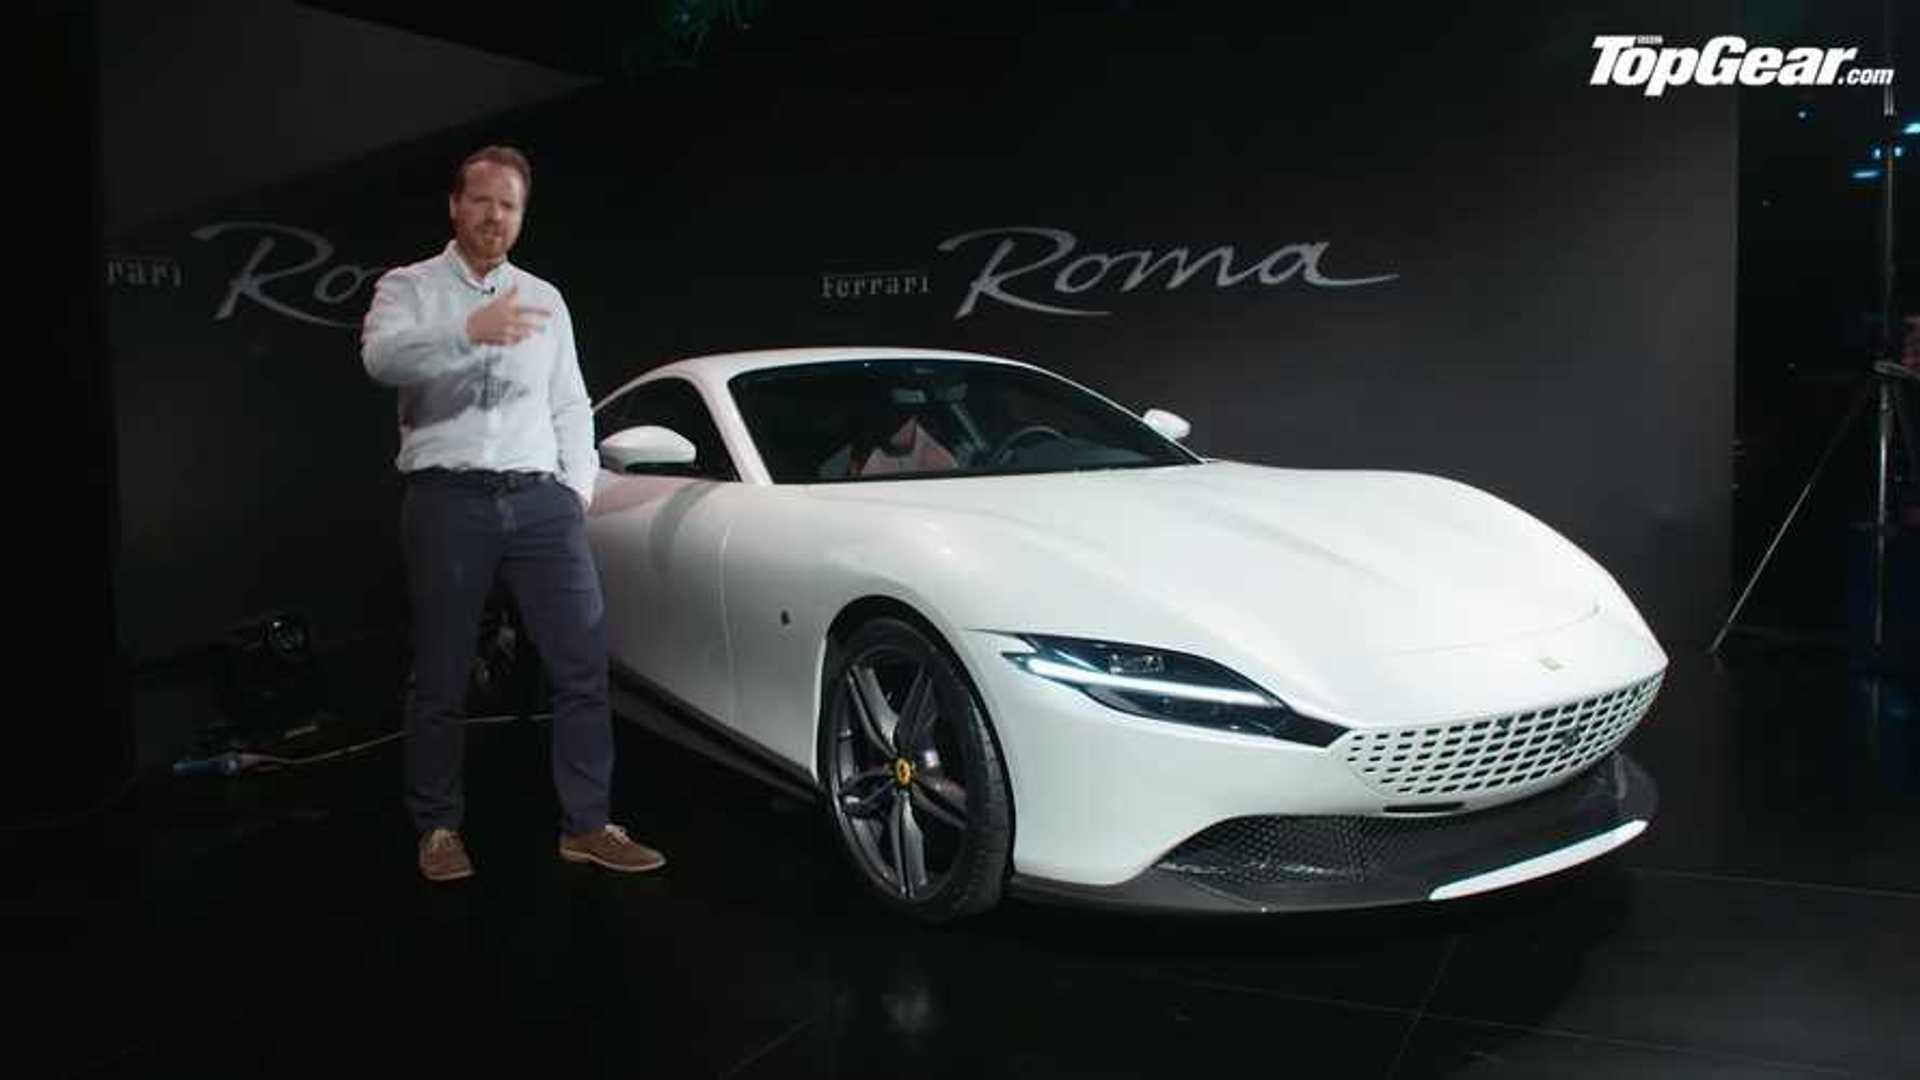 Top Gear Takes A Good Look At The Ferrari Roma